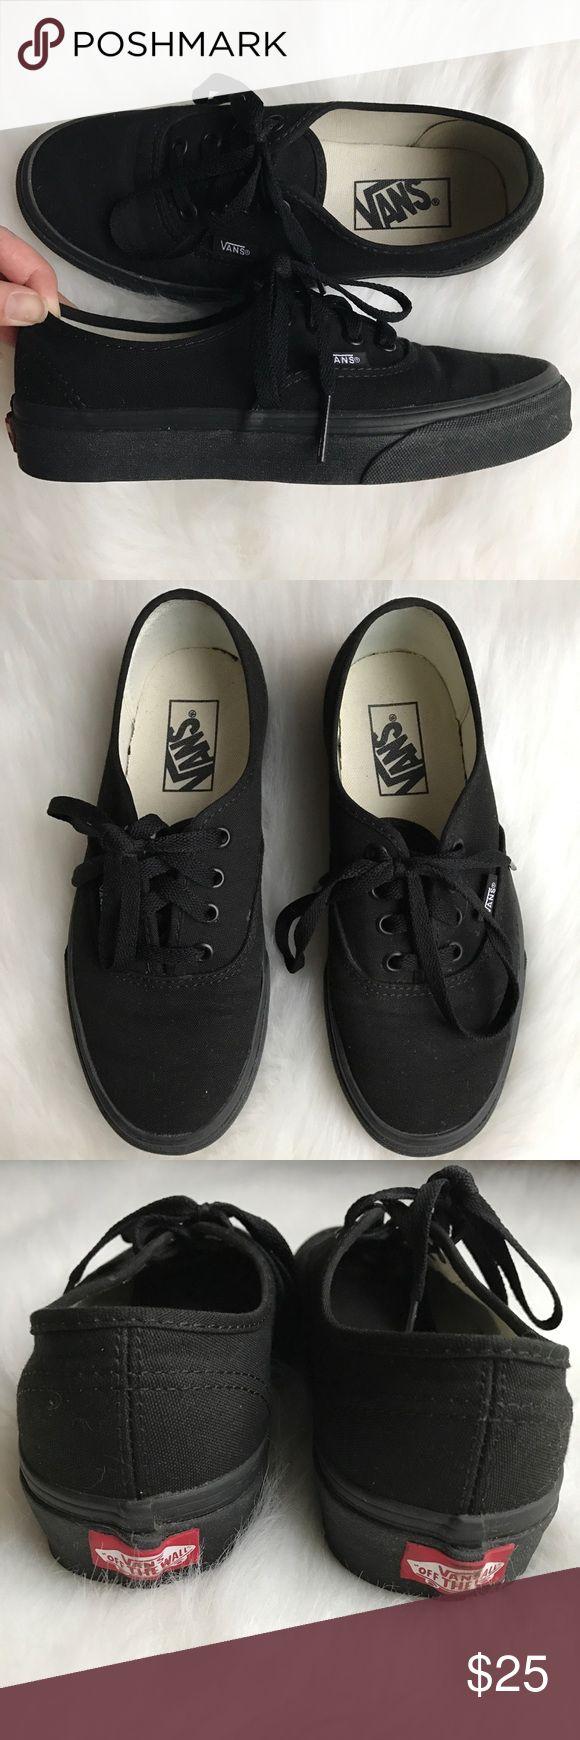 Vans 'Authentic' shoes Vans classic 'Authentic' shoes. Stylish black canvas shoes. Great condition, only worn a few times Vans Shoes Sneakers